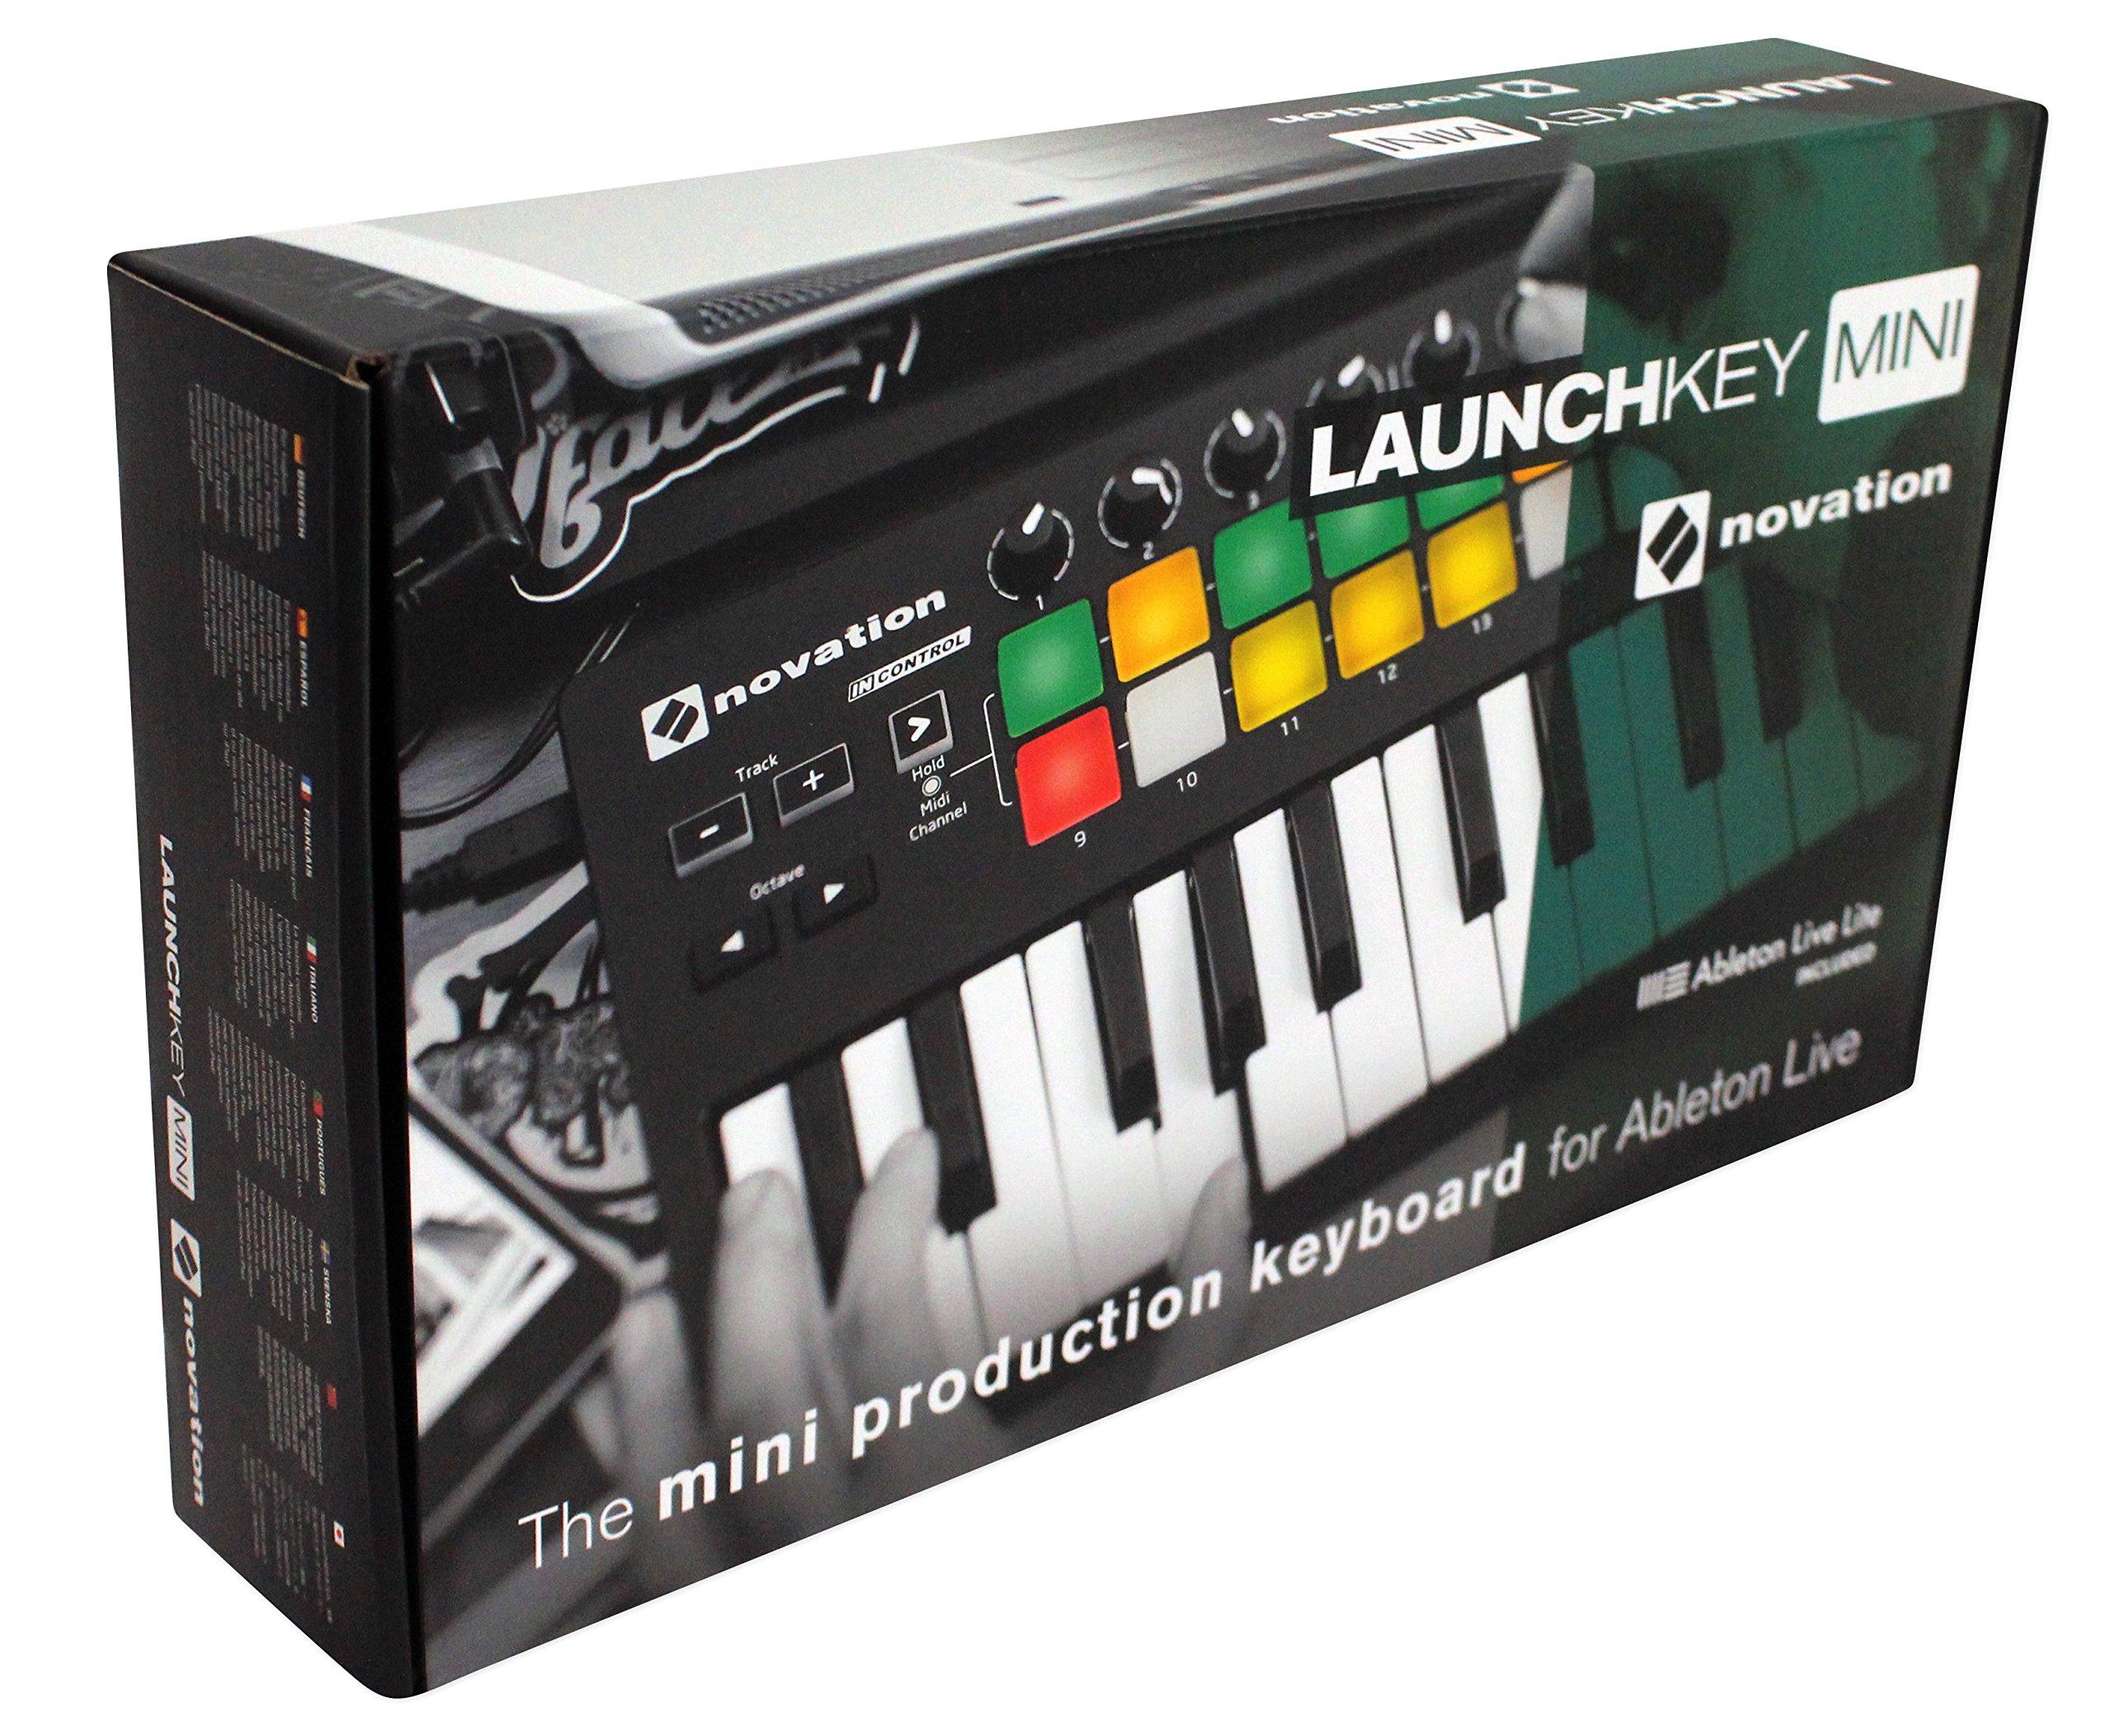 Novation LAUNCHKEY MINI MK2 25 Key USB Keyboard Controller+Bluetooth Speaker by Nov (Image #7)